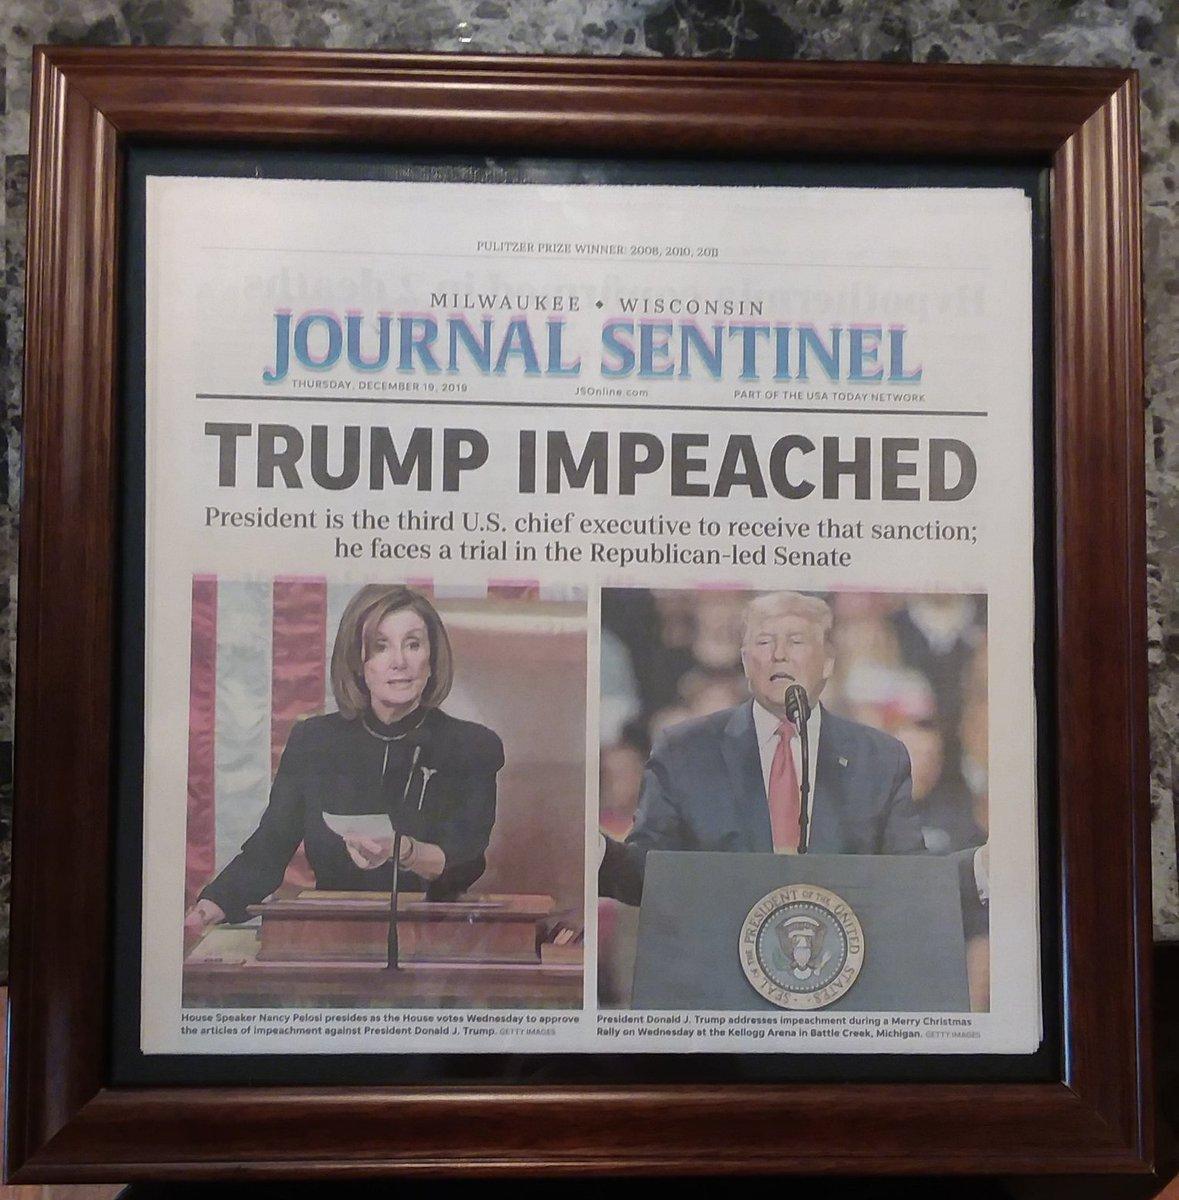 I finally got my 3 favorite newspapers framed up. I've got the perfect place to hang them later today. #BidenHarris2020 #BidenHarrisInauguration #ImpeachmentDay #TrumpImpeachment #TrumpImpeachedTwice